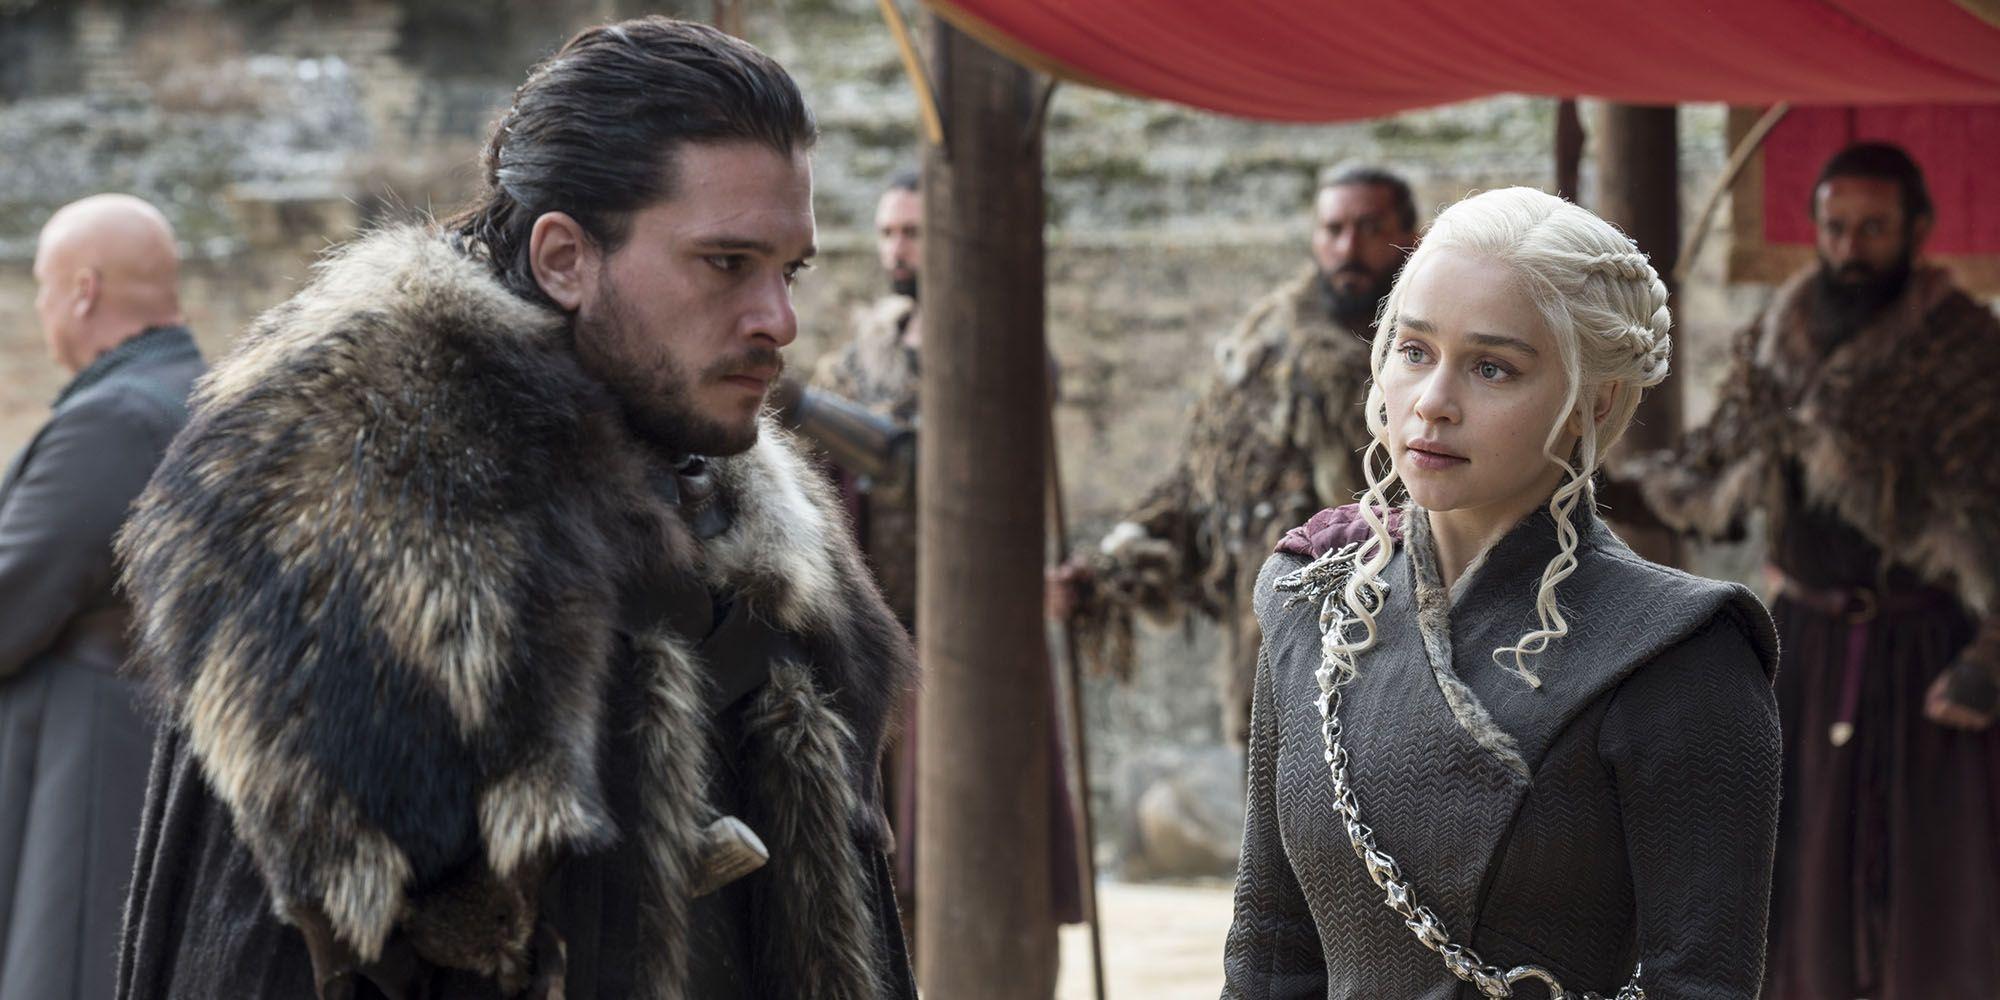 game of thrones, jon snow, daenerys targaryen